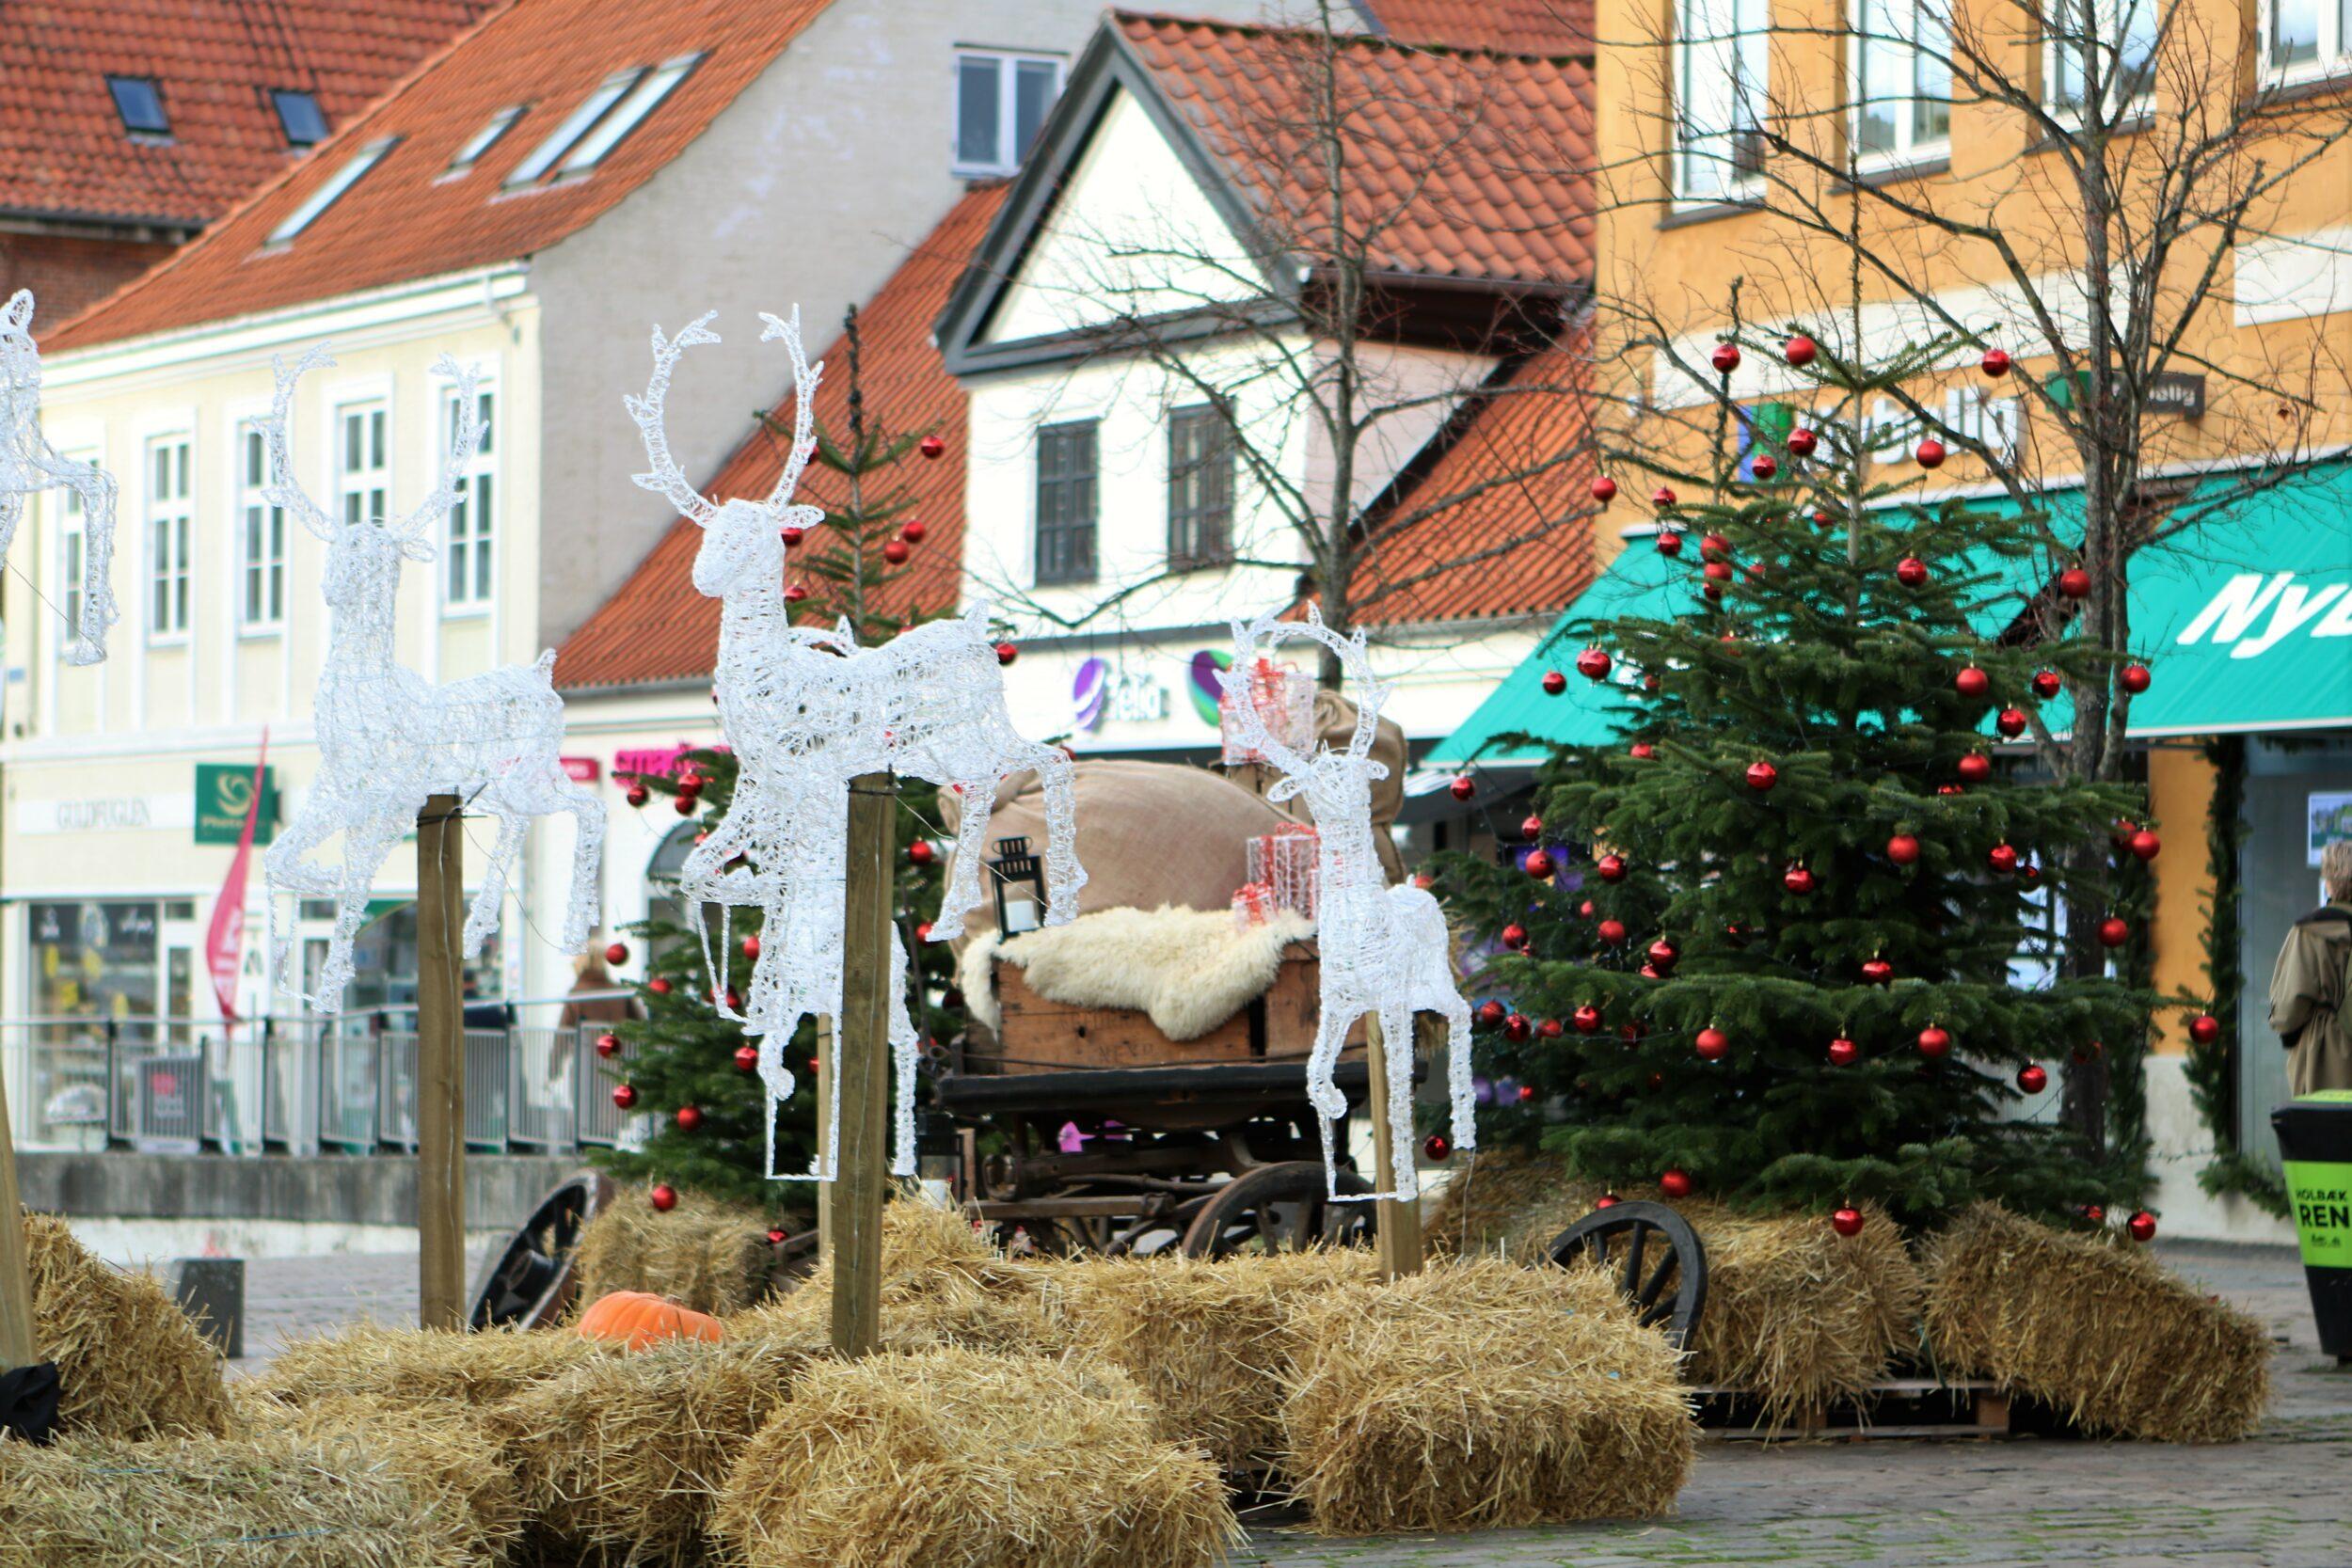 Julen er kommet til Holbæk